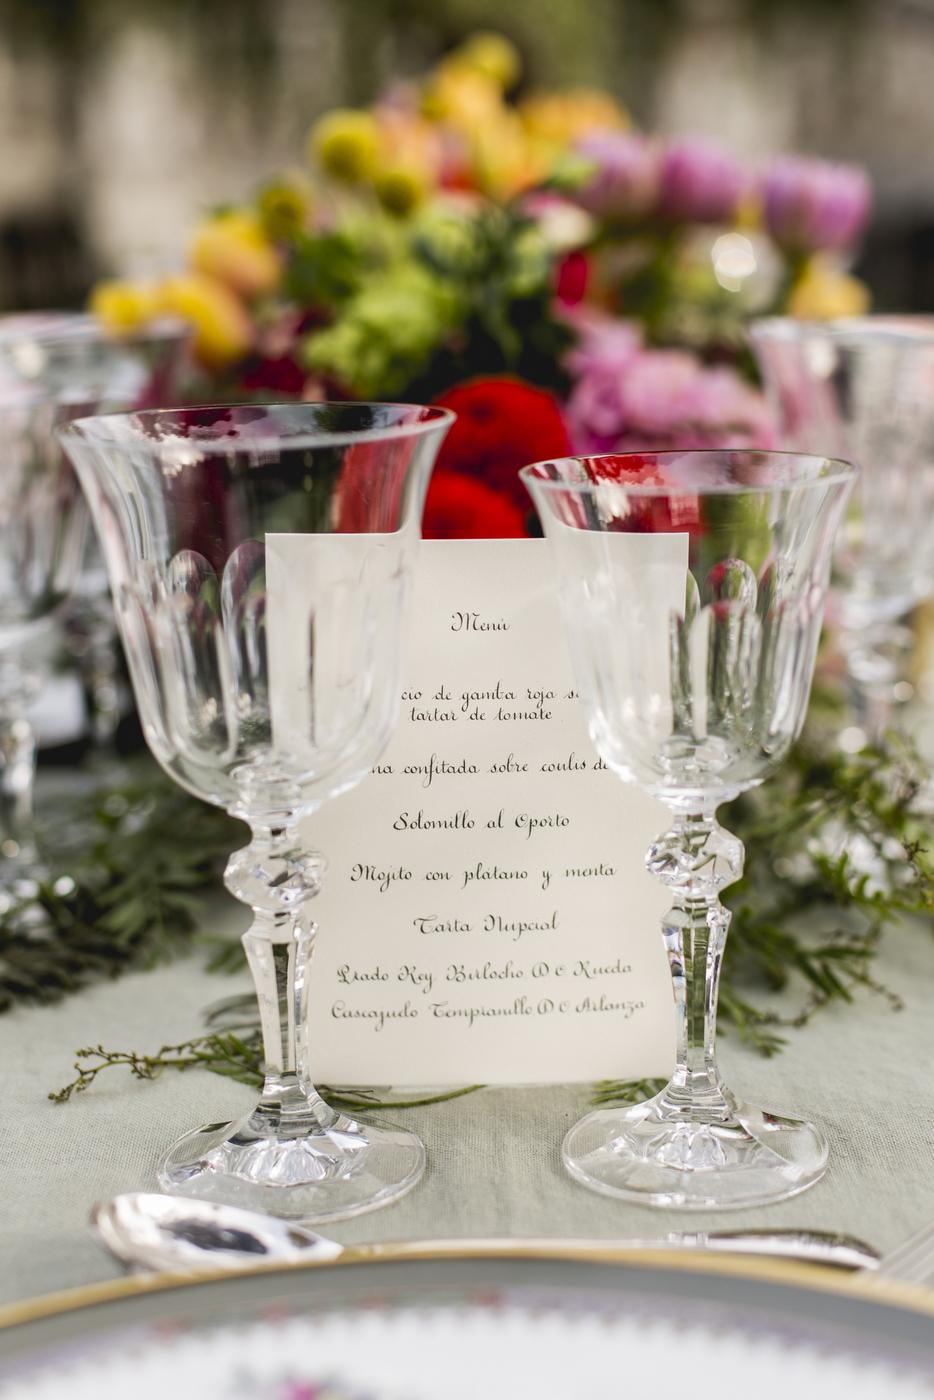 calista-one-lista-de-bodas-online-blog-de-bodas-inpisracion-bodas-la-boda-sonada-14